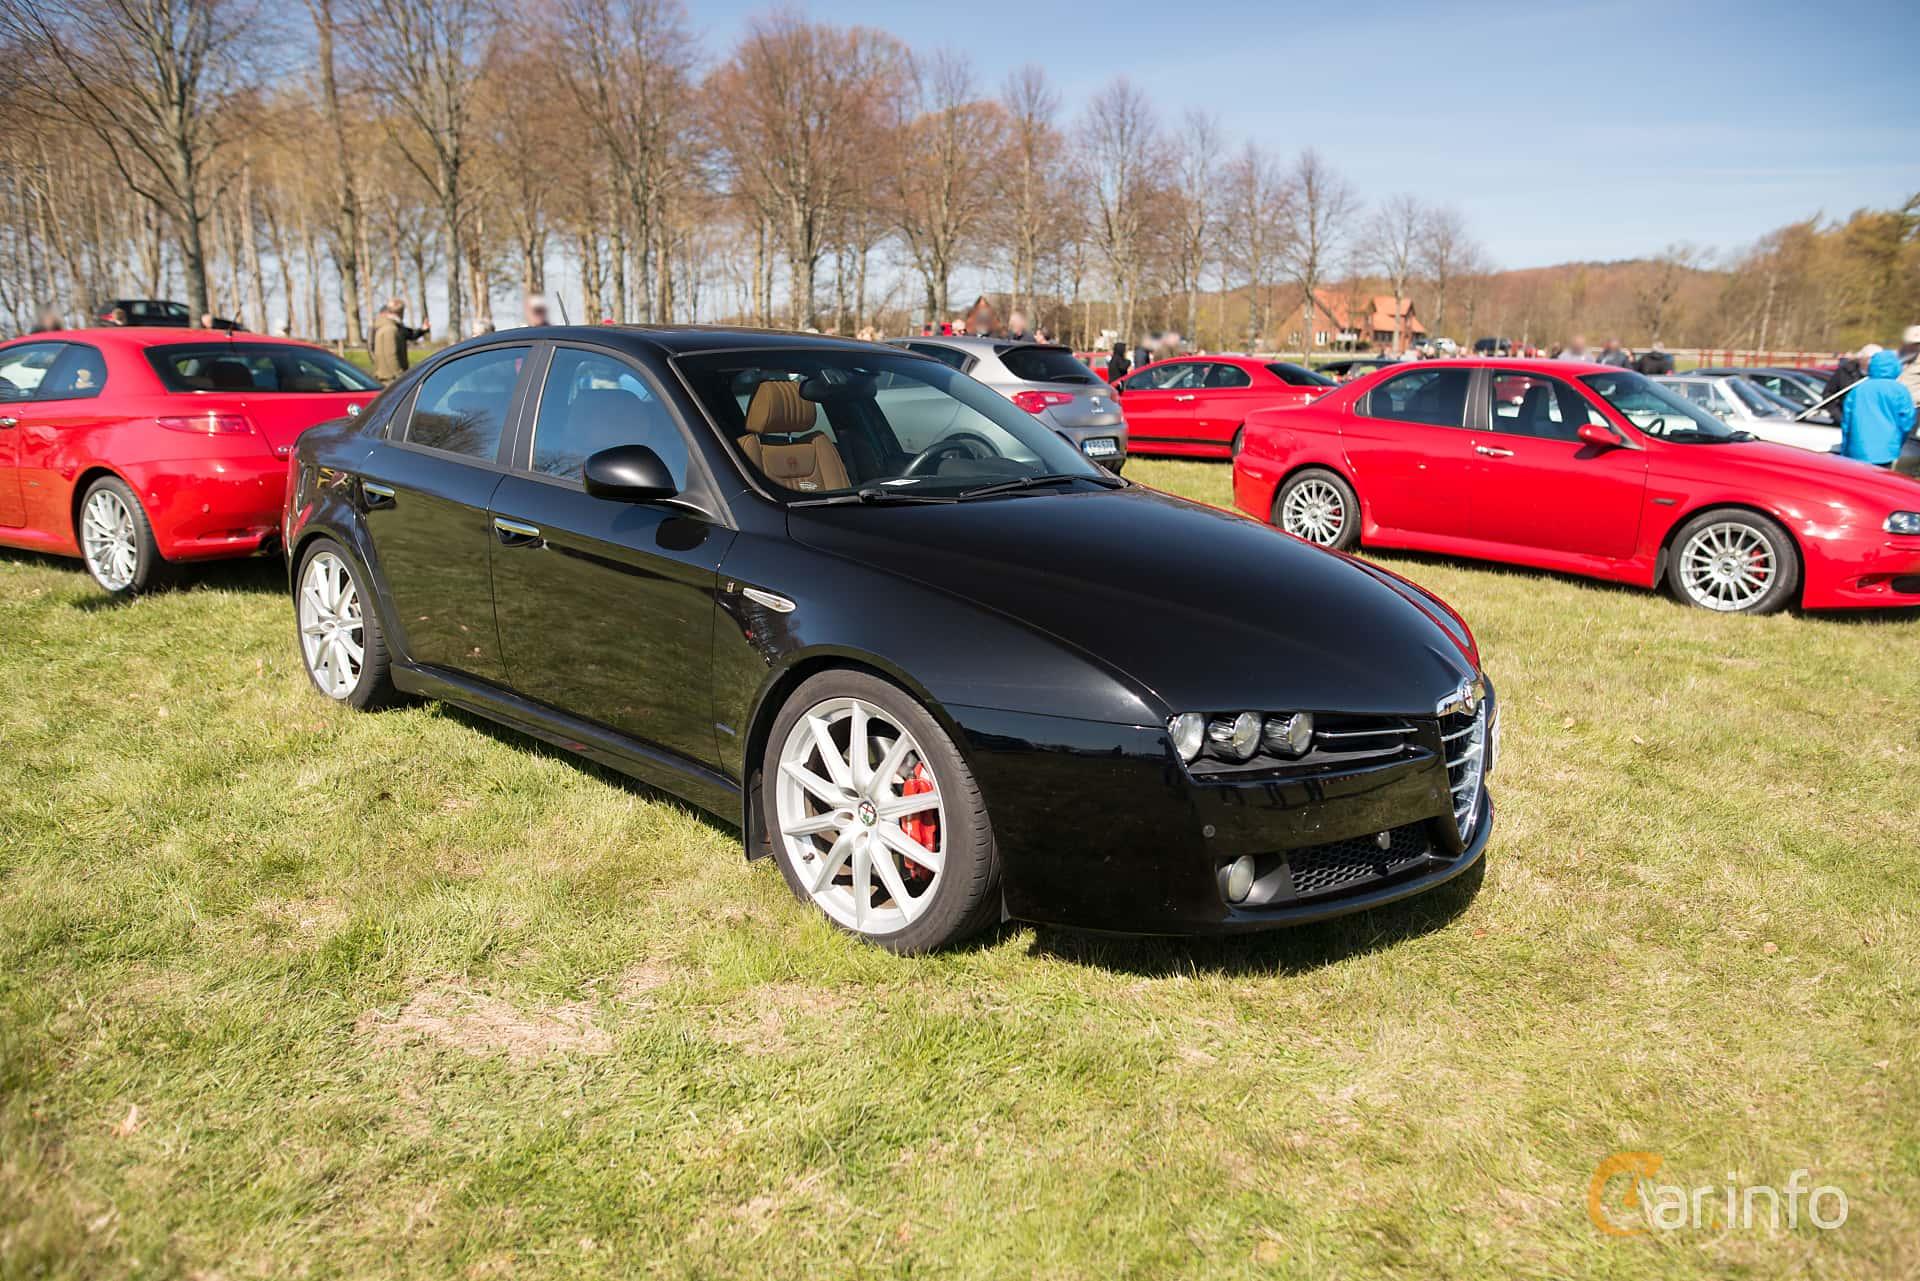 Alfa Romeo 159 Generation 939 Facelift 2 0 Jtdm 16v Manual border=